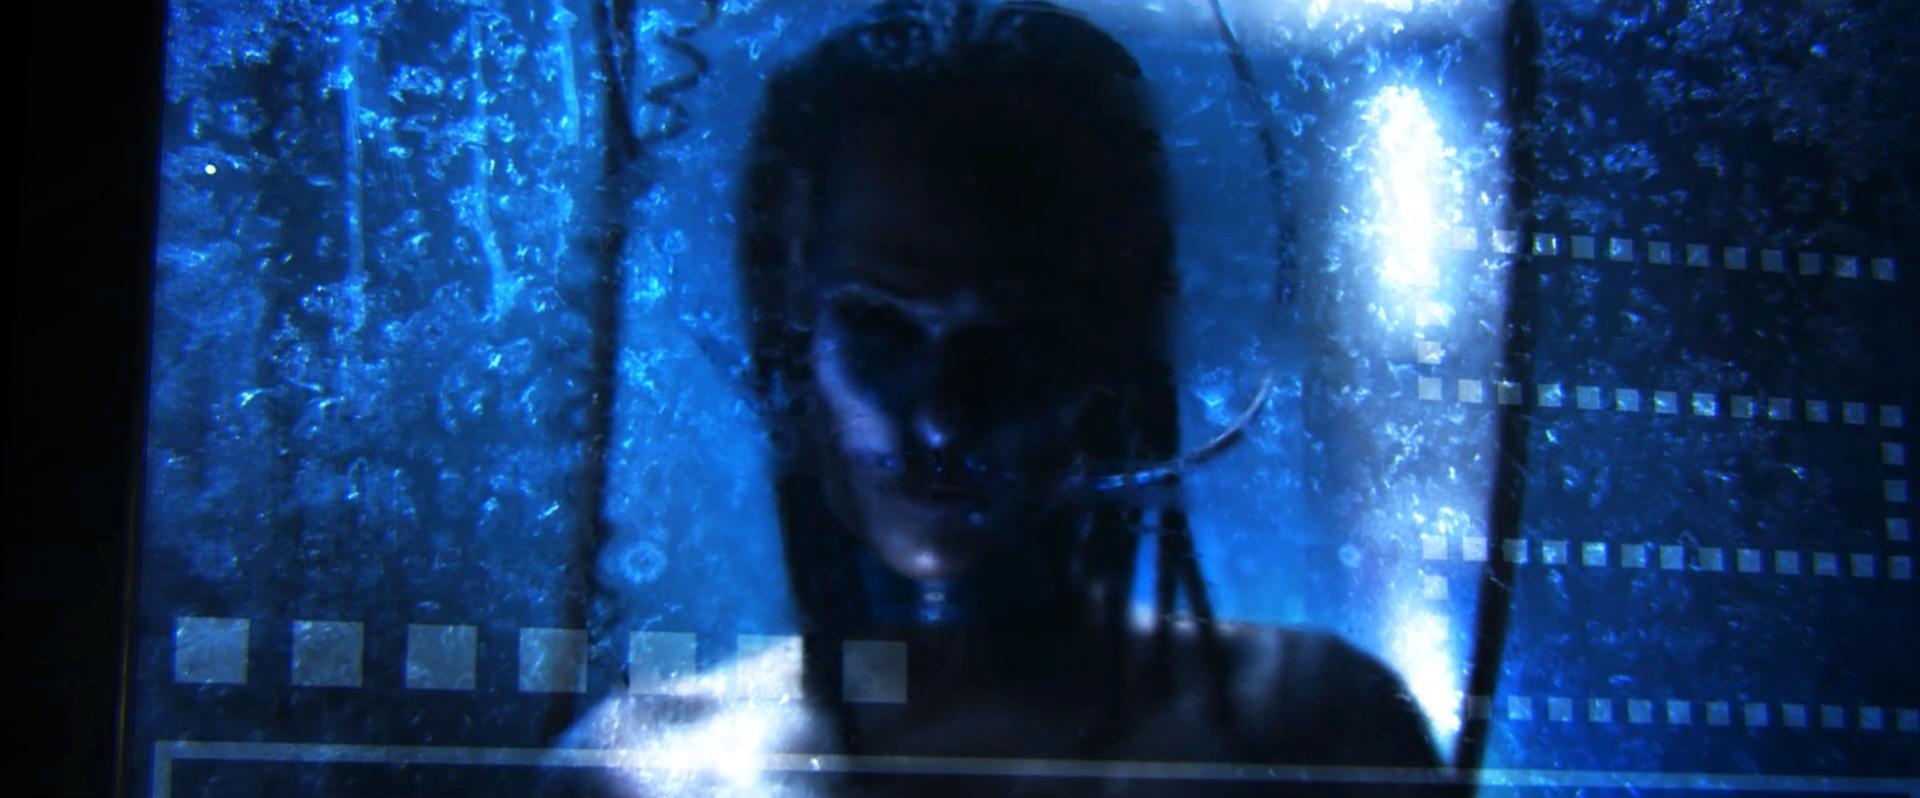 amazingly-cool-sci-fi-short-film-azarkant-12.jpg